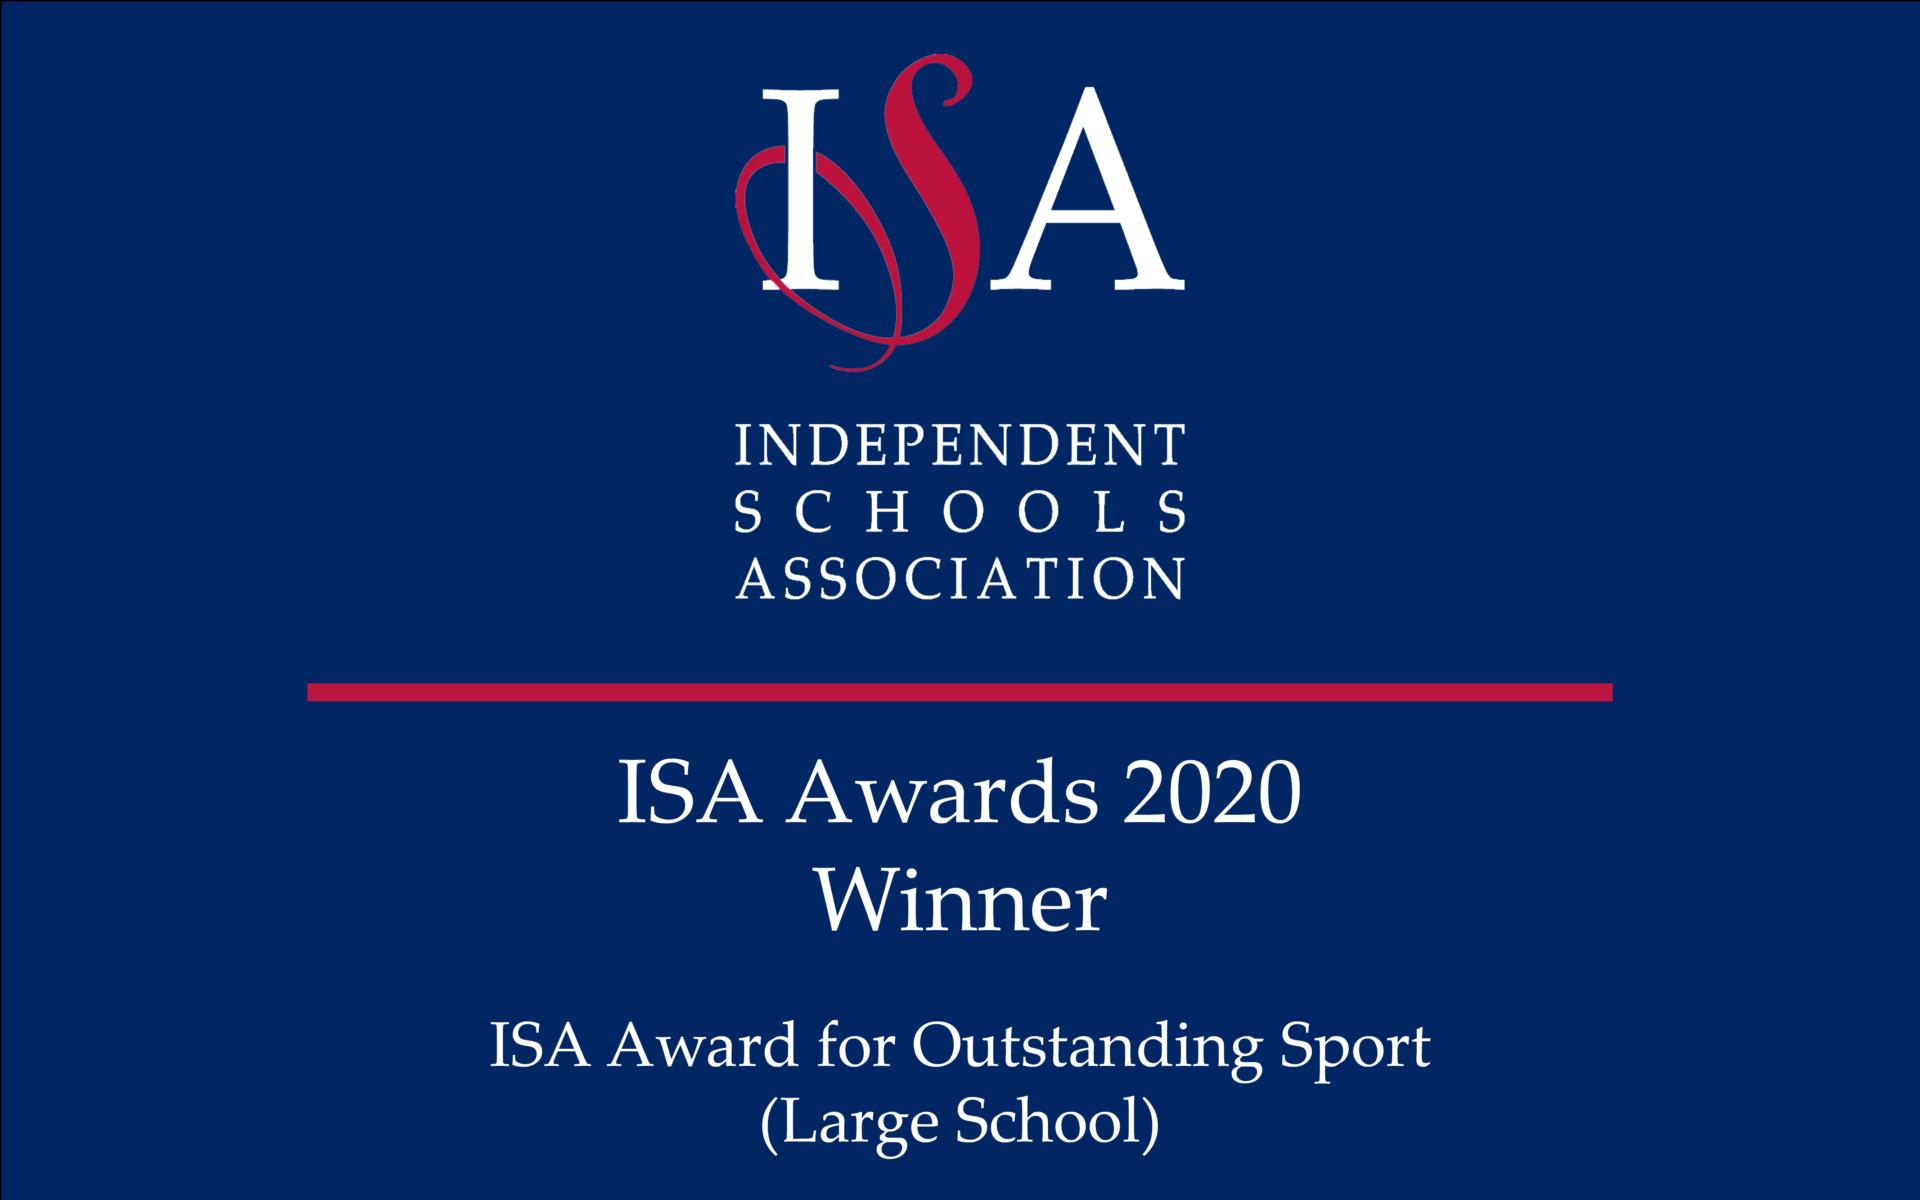 ISA Award winner badge